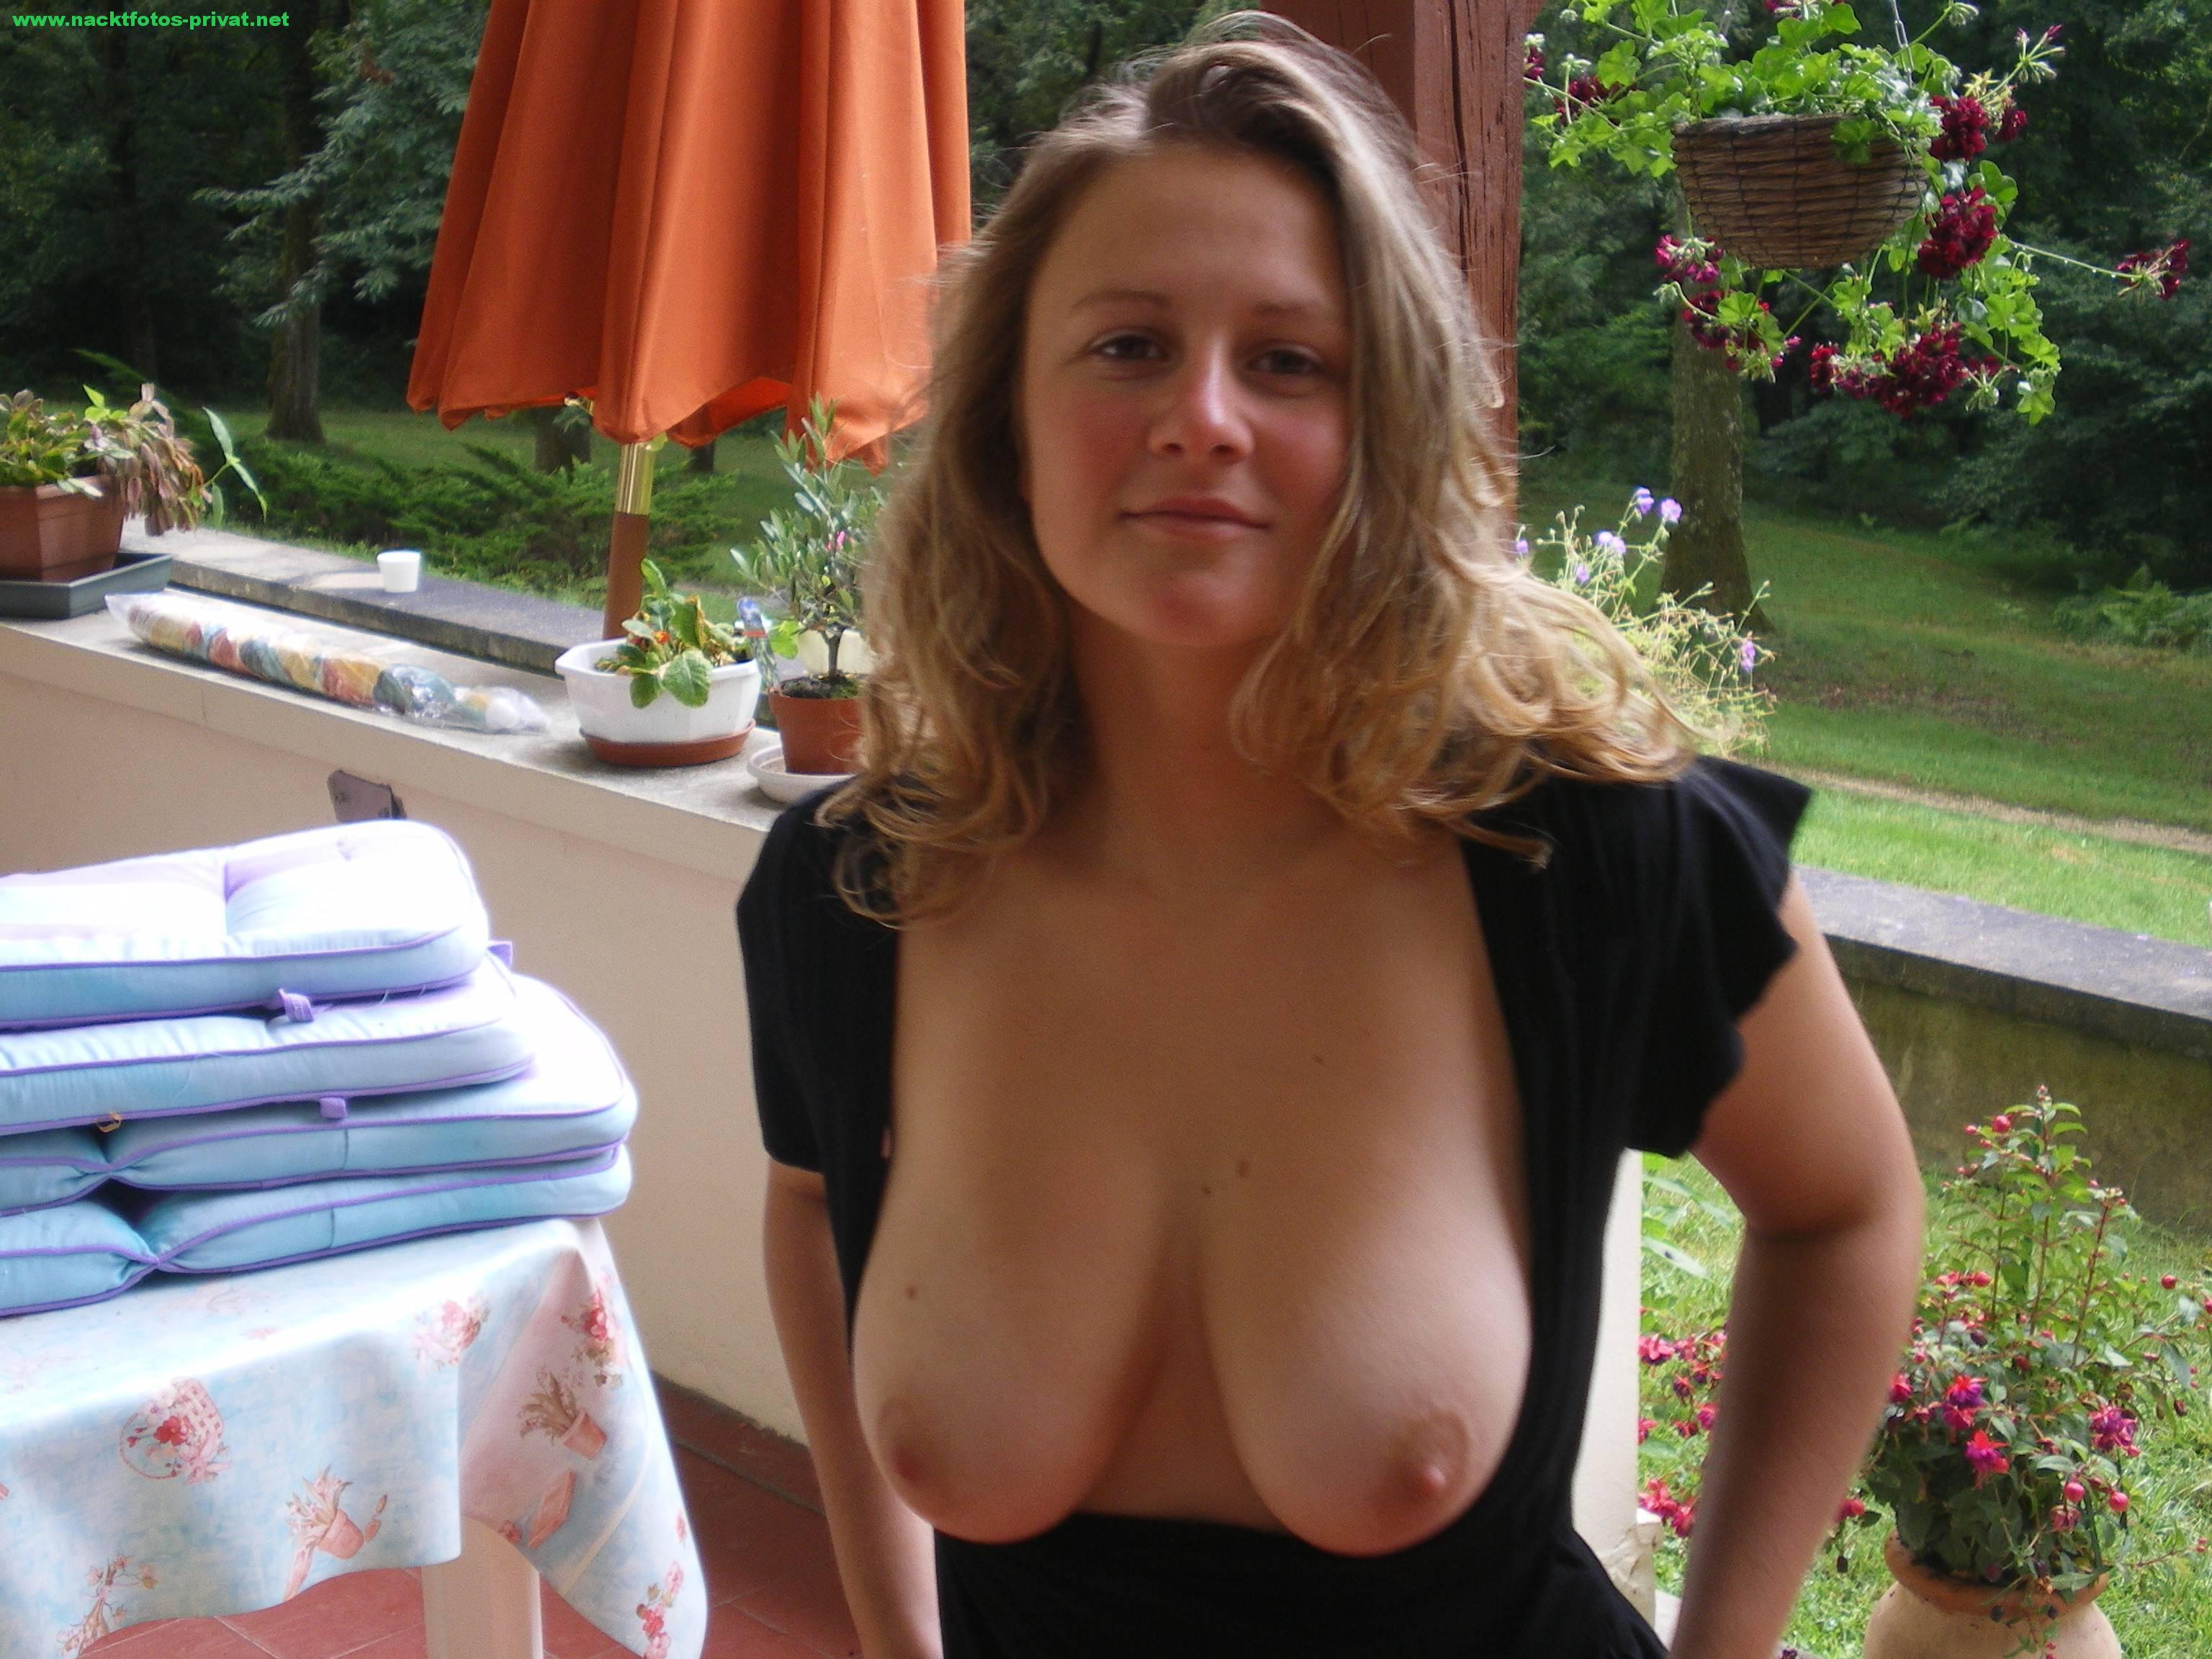 Geile Natuerliche Grosse Titten Sexy Suess Exfreundin Privates Foto